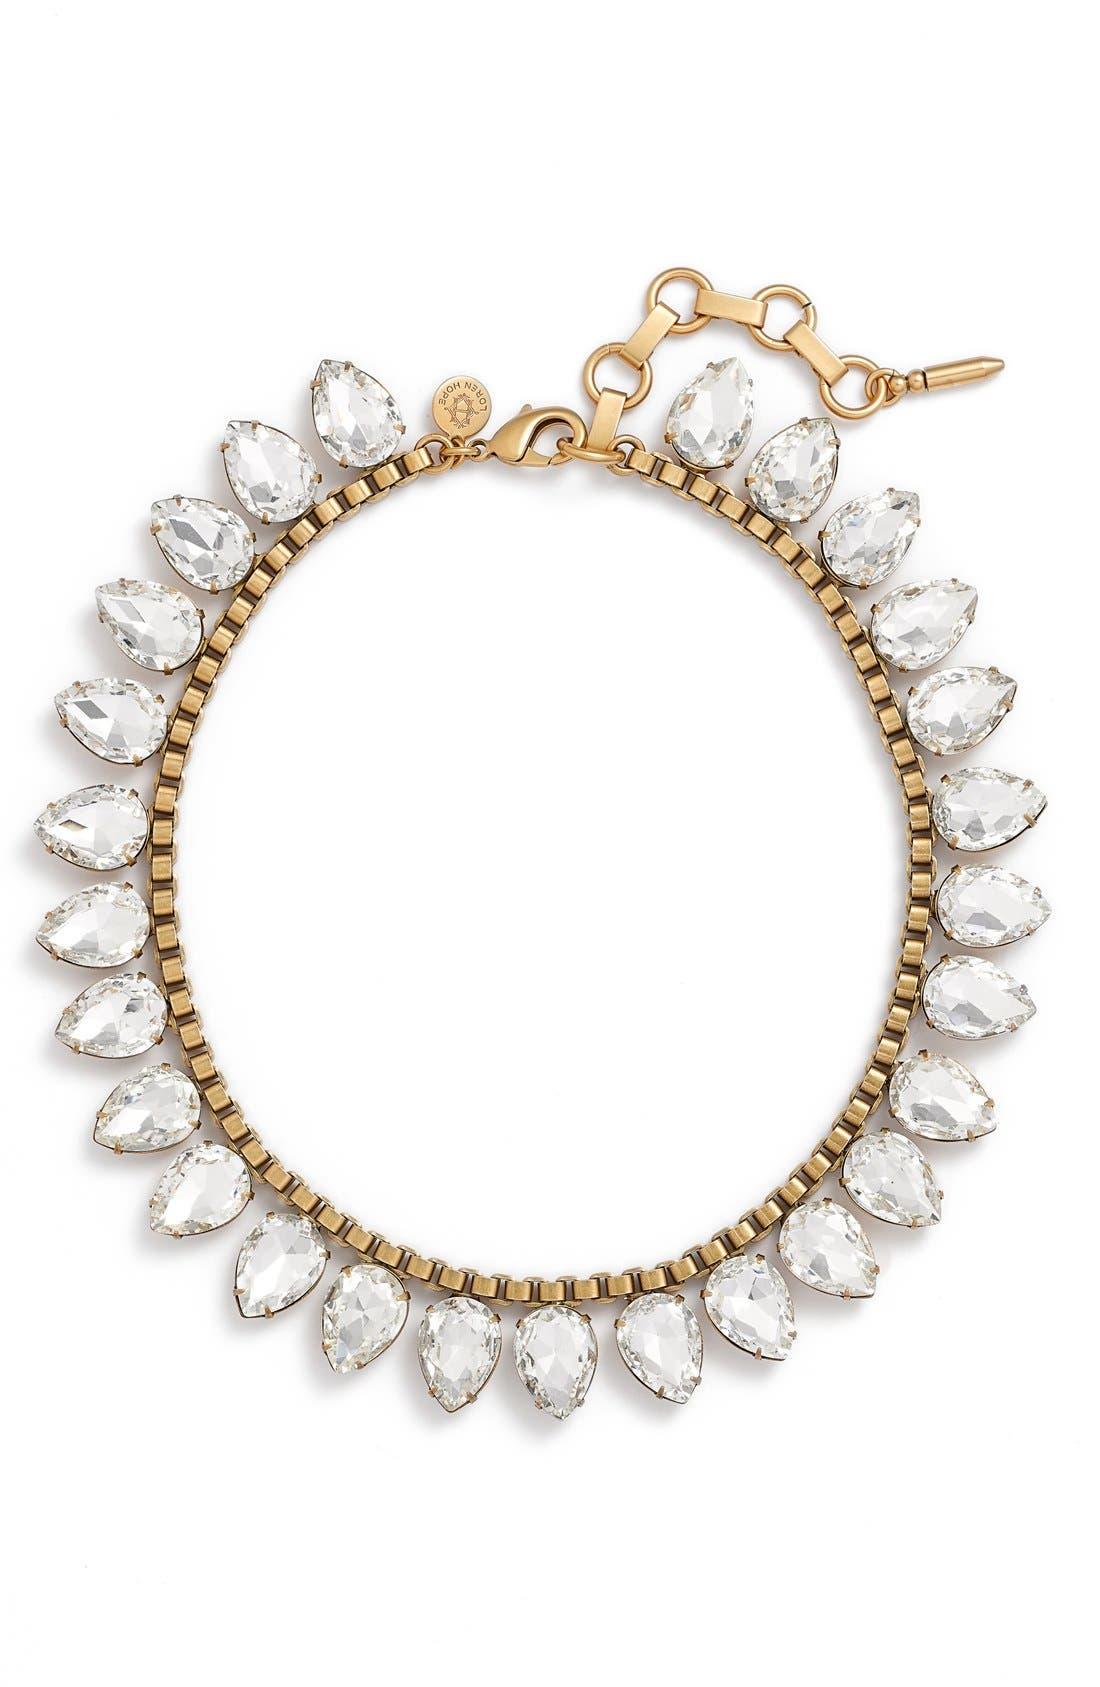 Loren Hope 'Sylvia' Crystal Collar Necklace